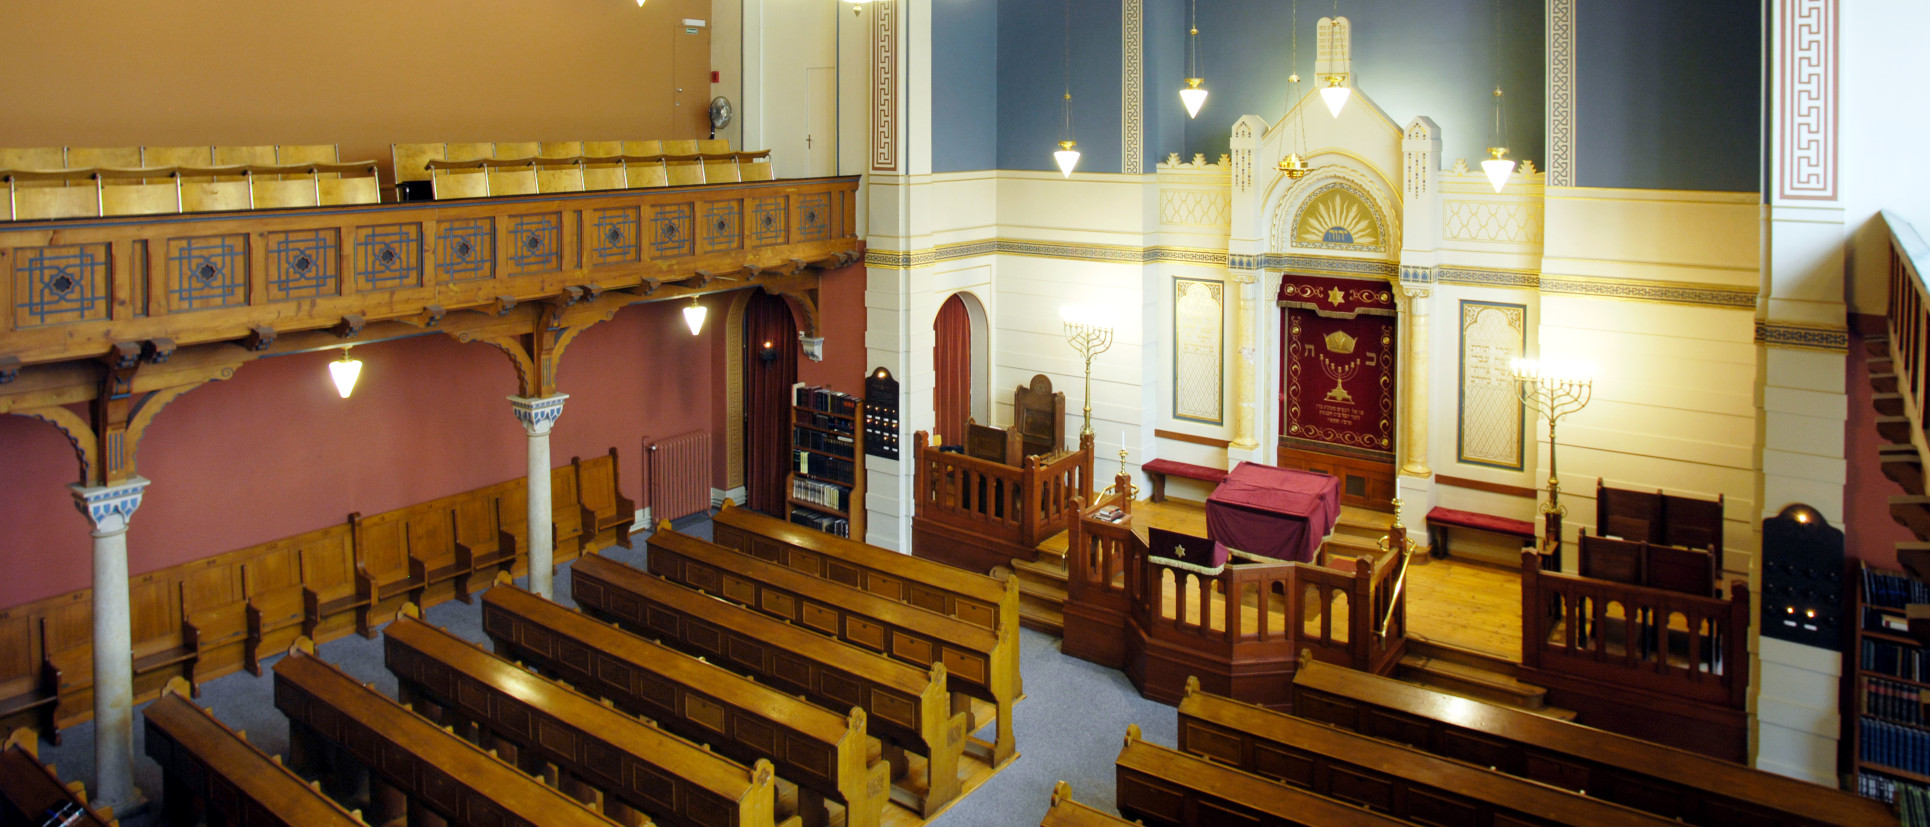 Synagoge in Bern